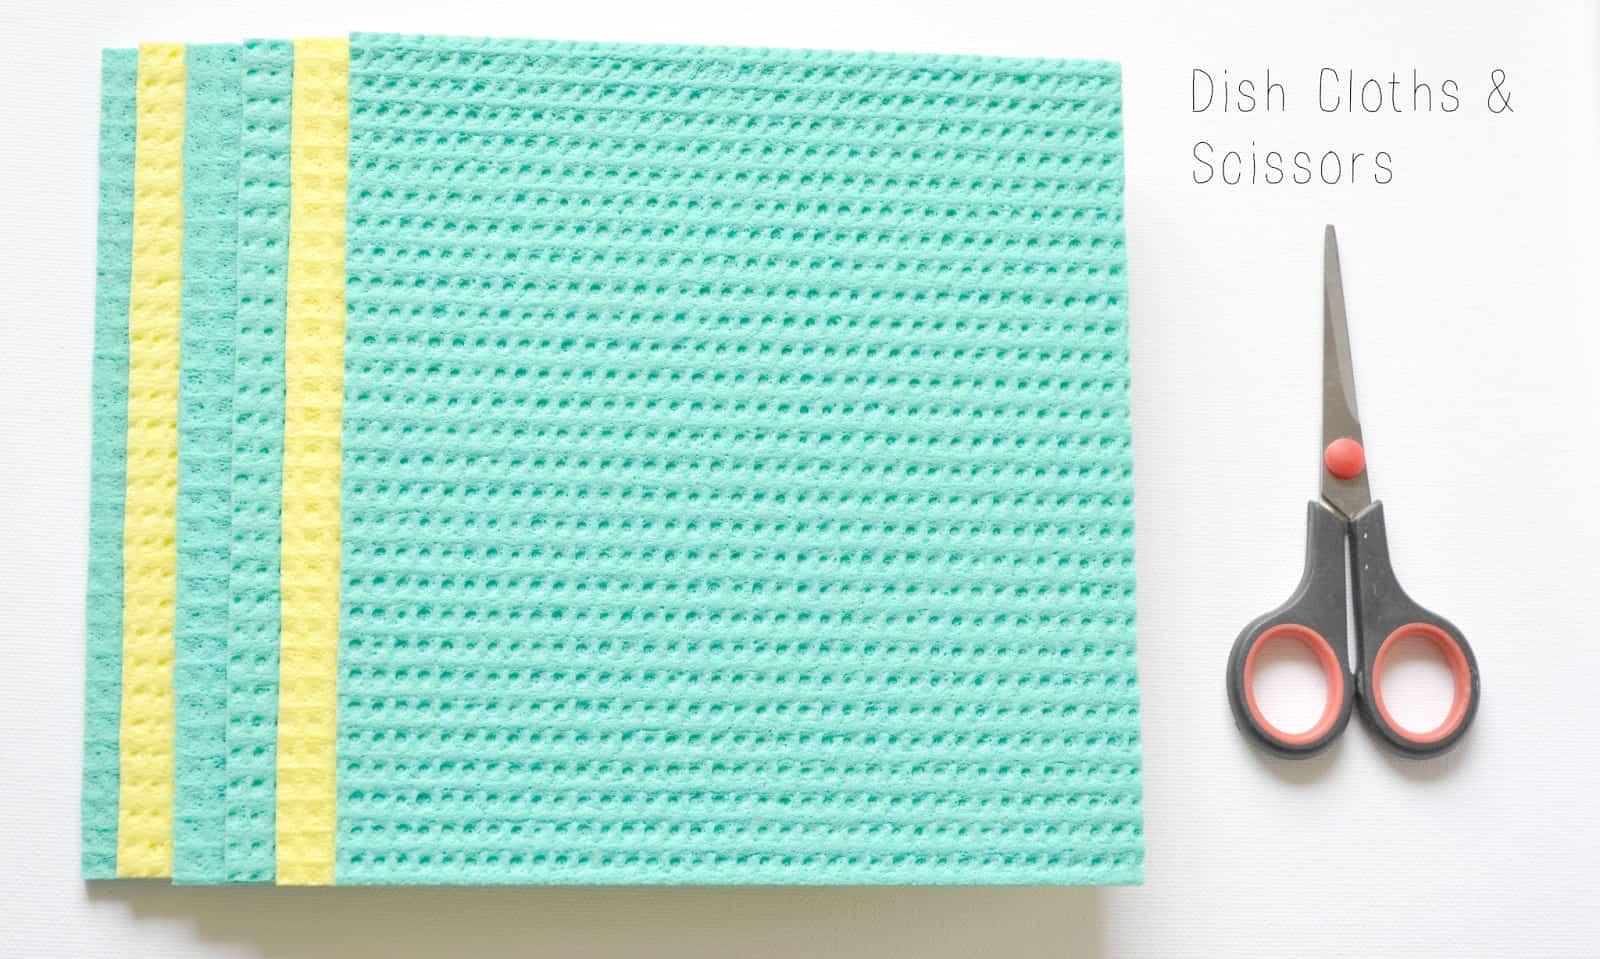 DIY jewelry box using shoebox and dish cloths